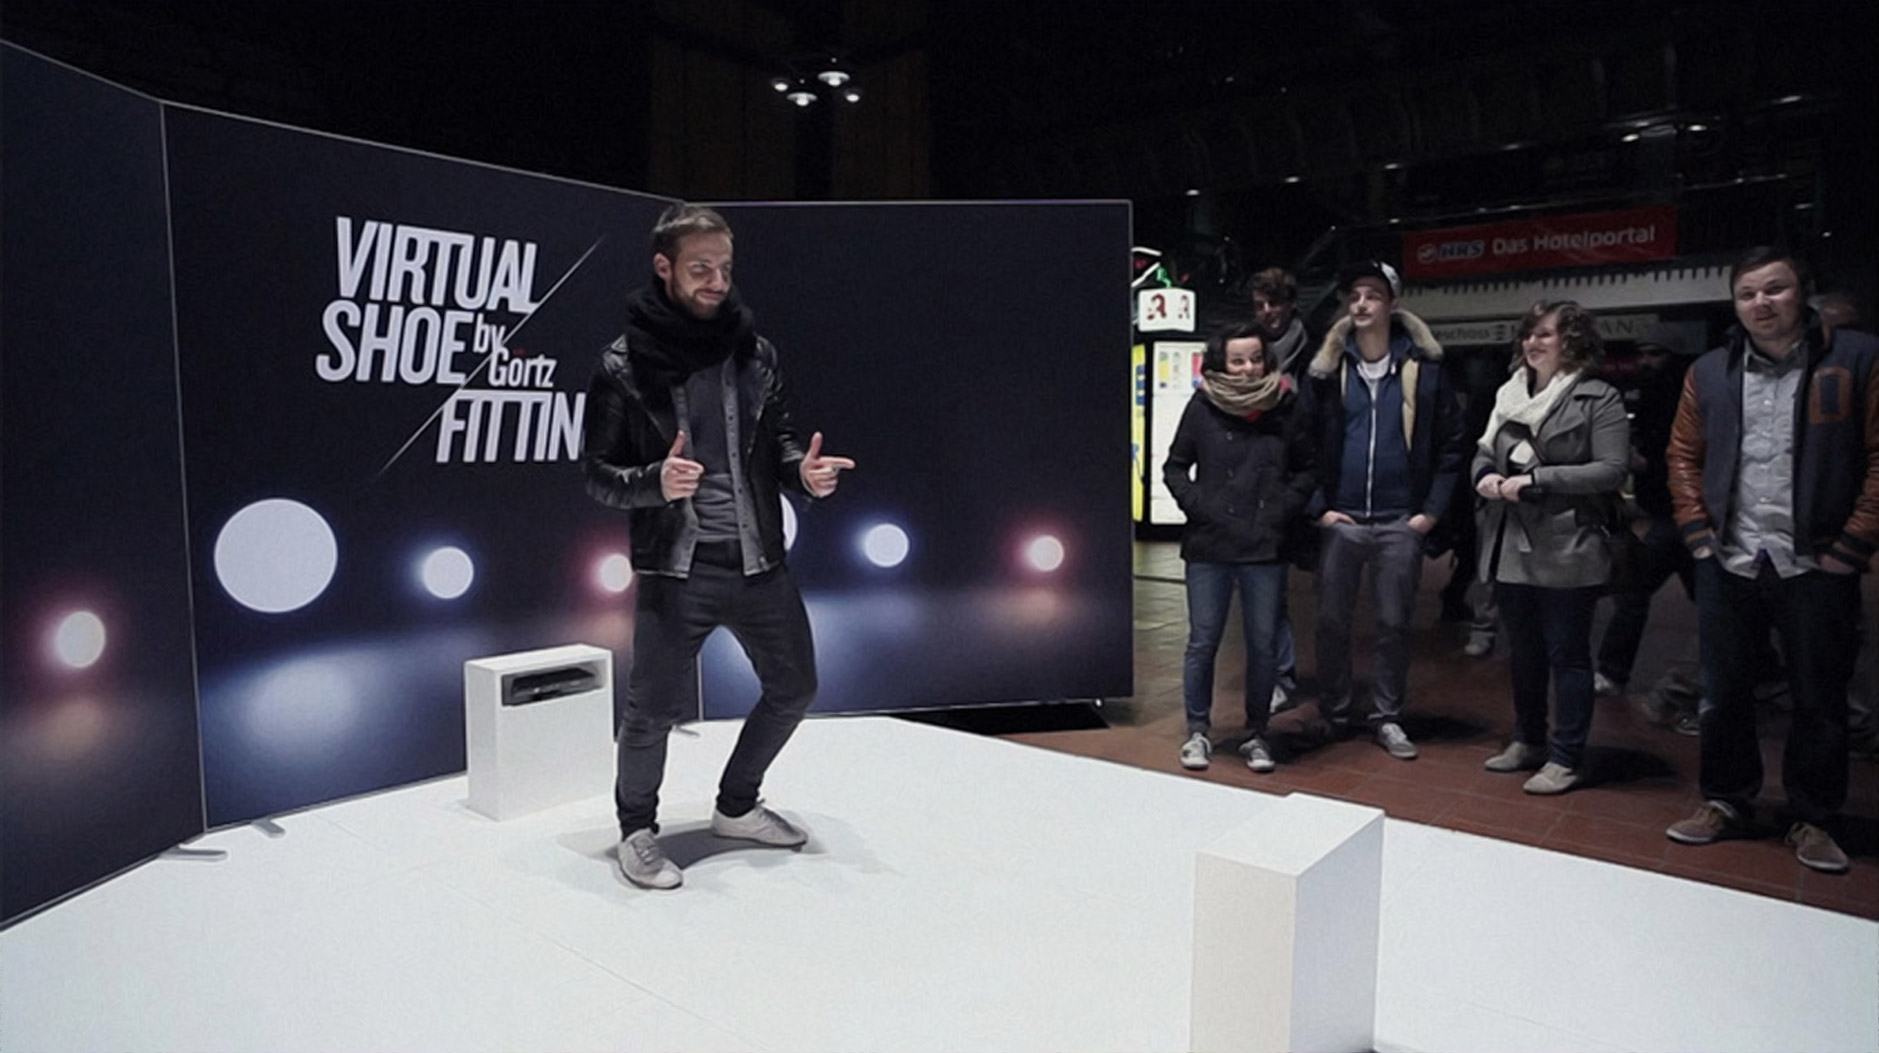 Virtual Shoe Fitting